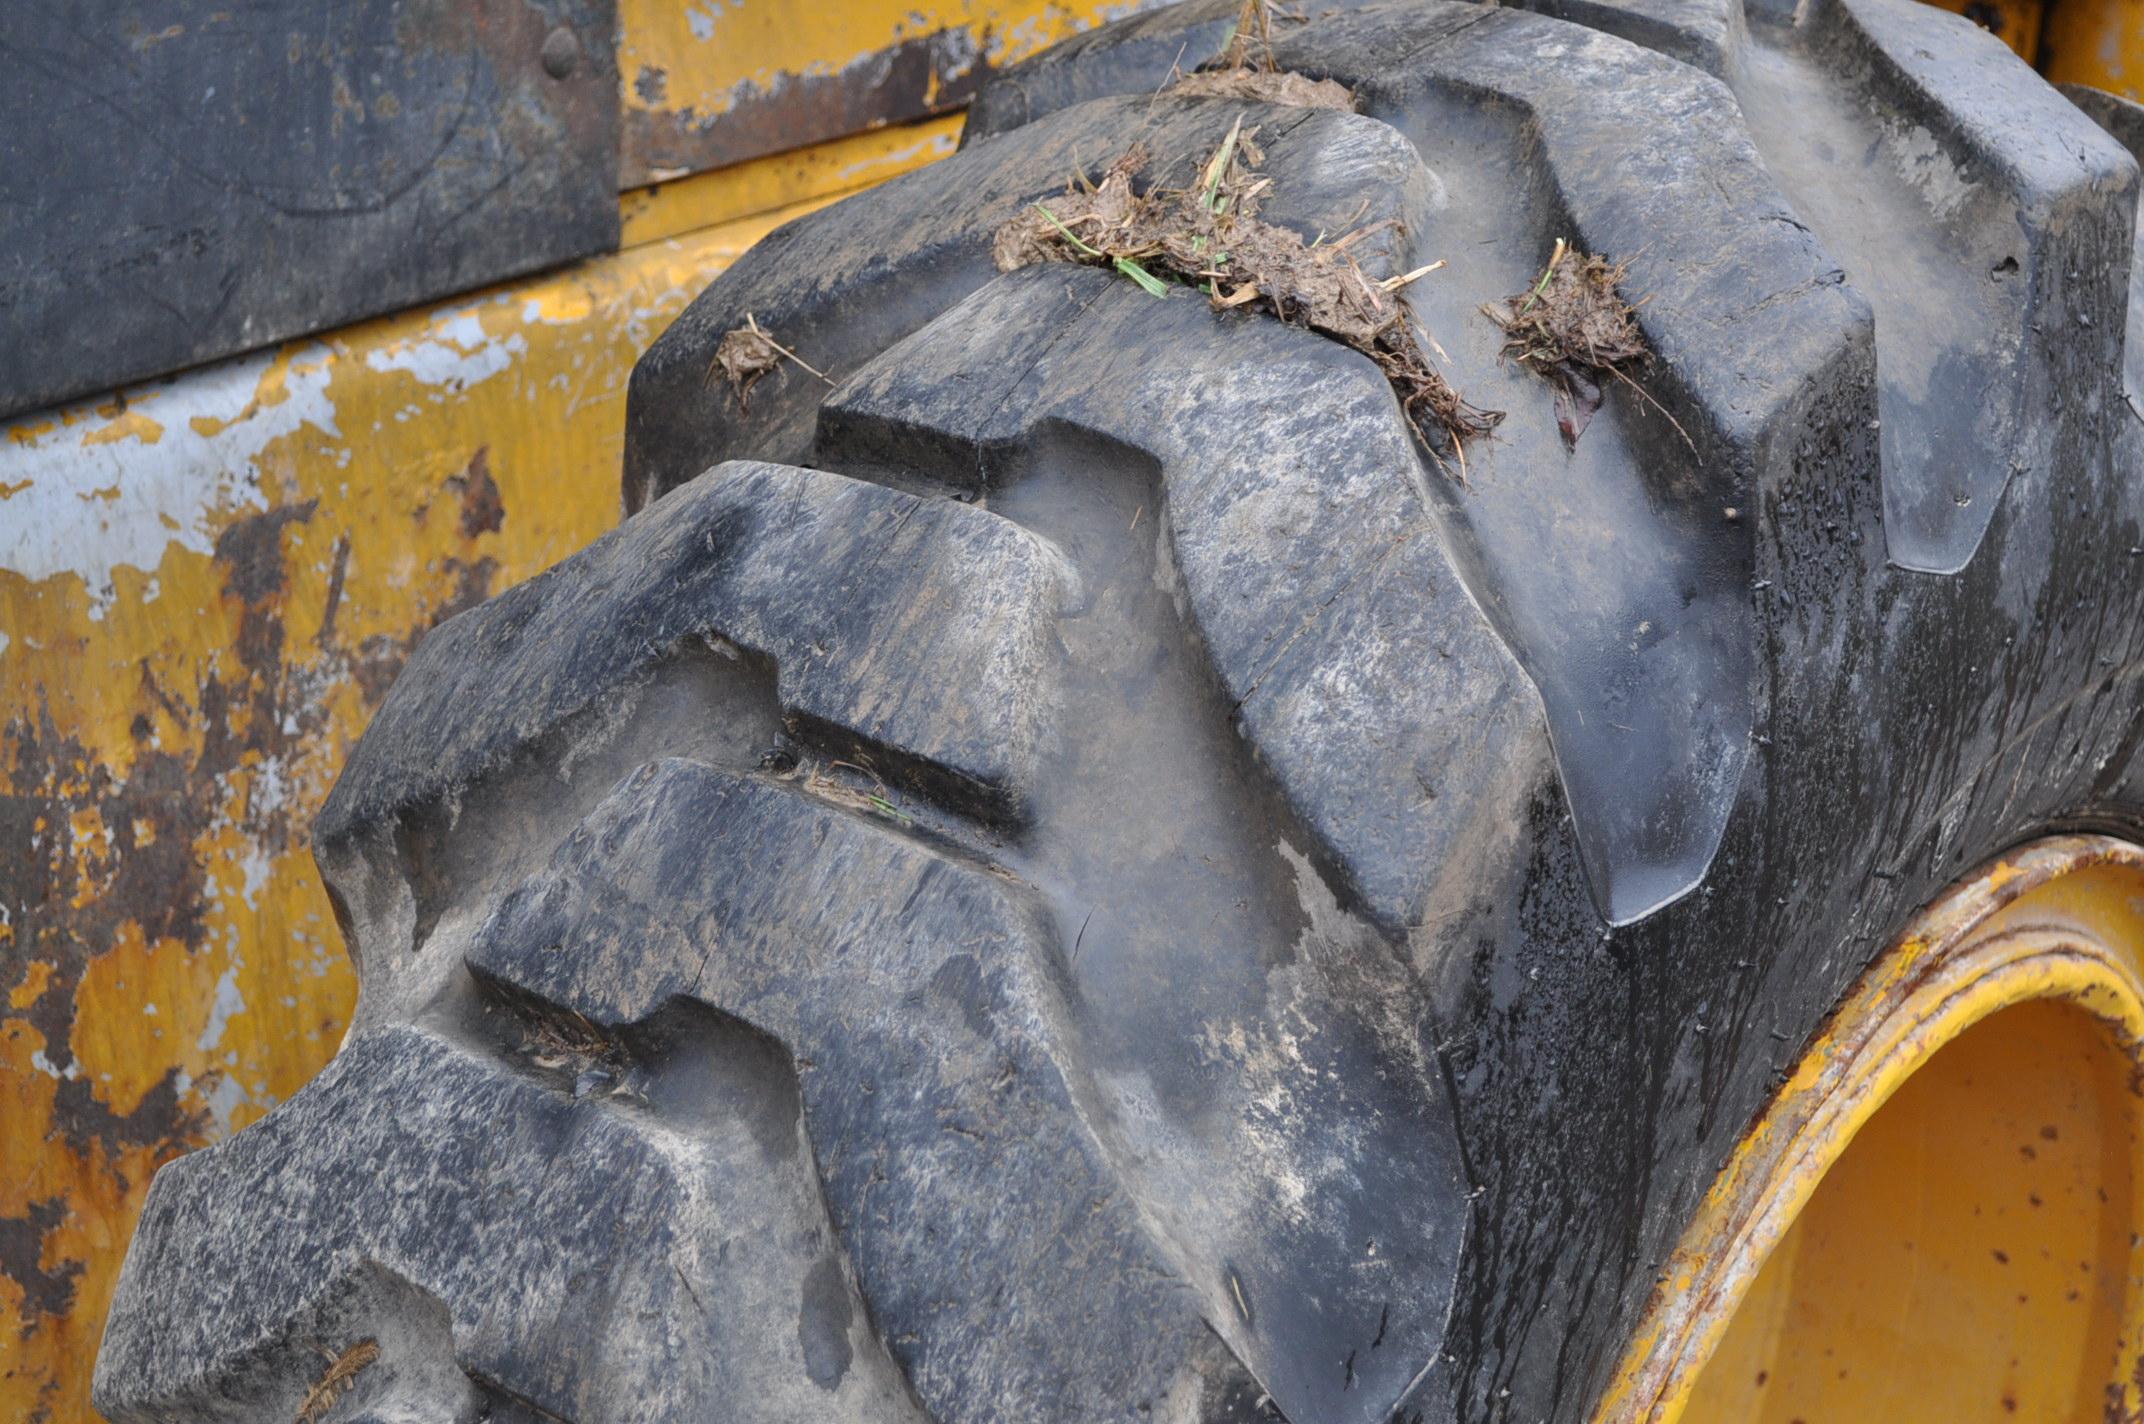 John Deere 544 Payloader, 17.5-25 tires, shows 1074 hrs, SN 0767621 - Image 8 of 16